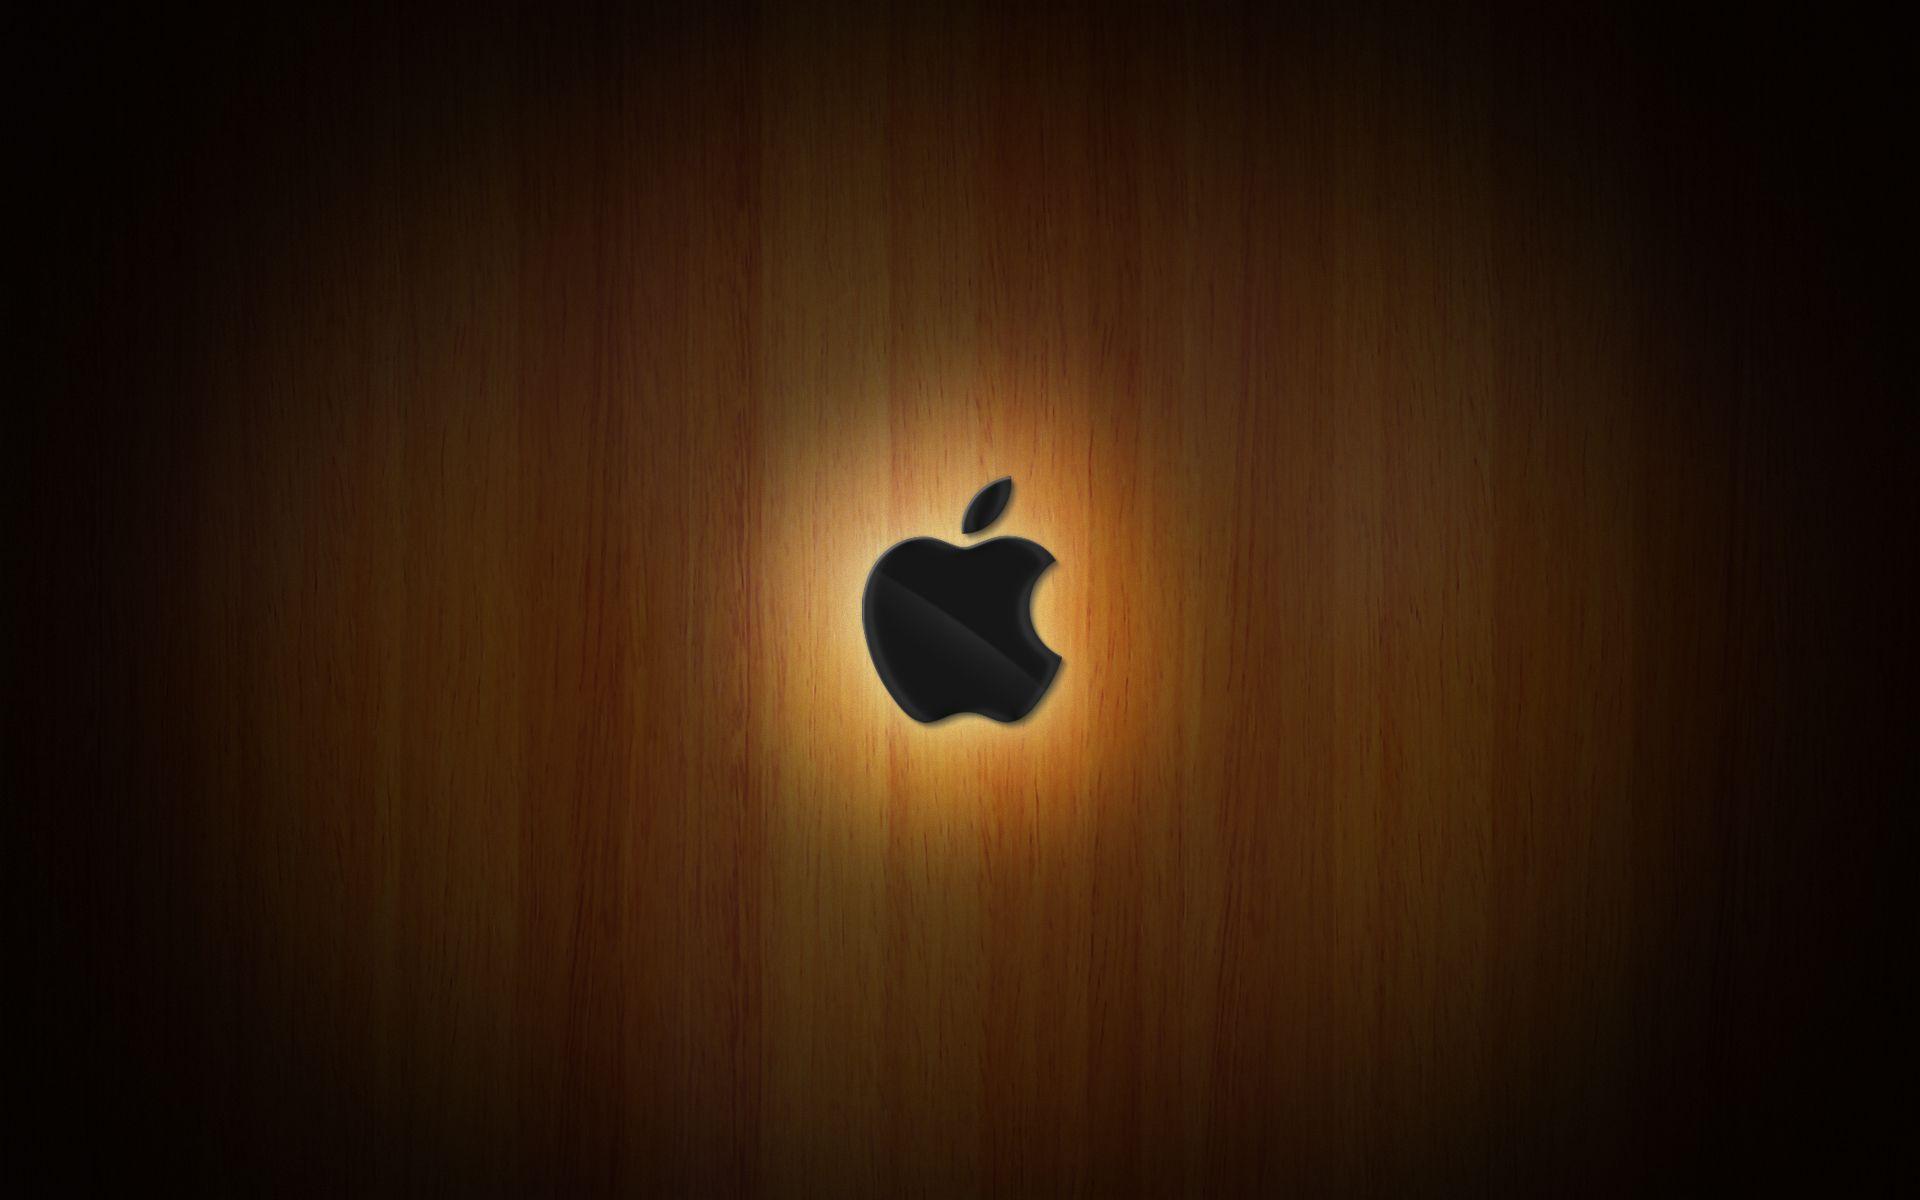 Mac Os Brown 22238925 1920 1200 Jpg 1920 1200 Hd Apple Wallpapers Apple Logo Wallpaper Apple Wallpaper Iphone